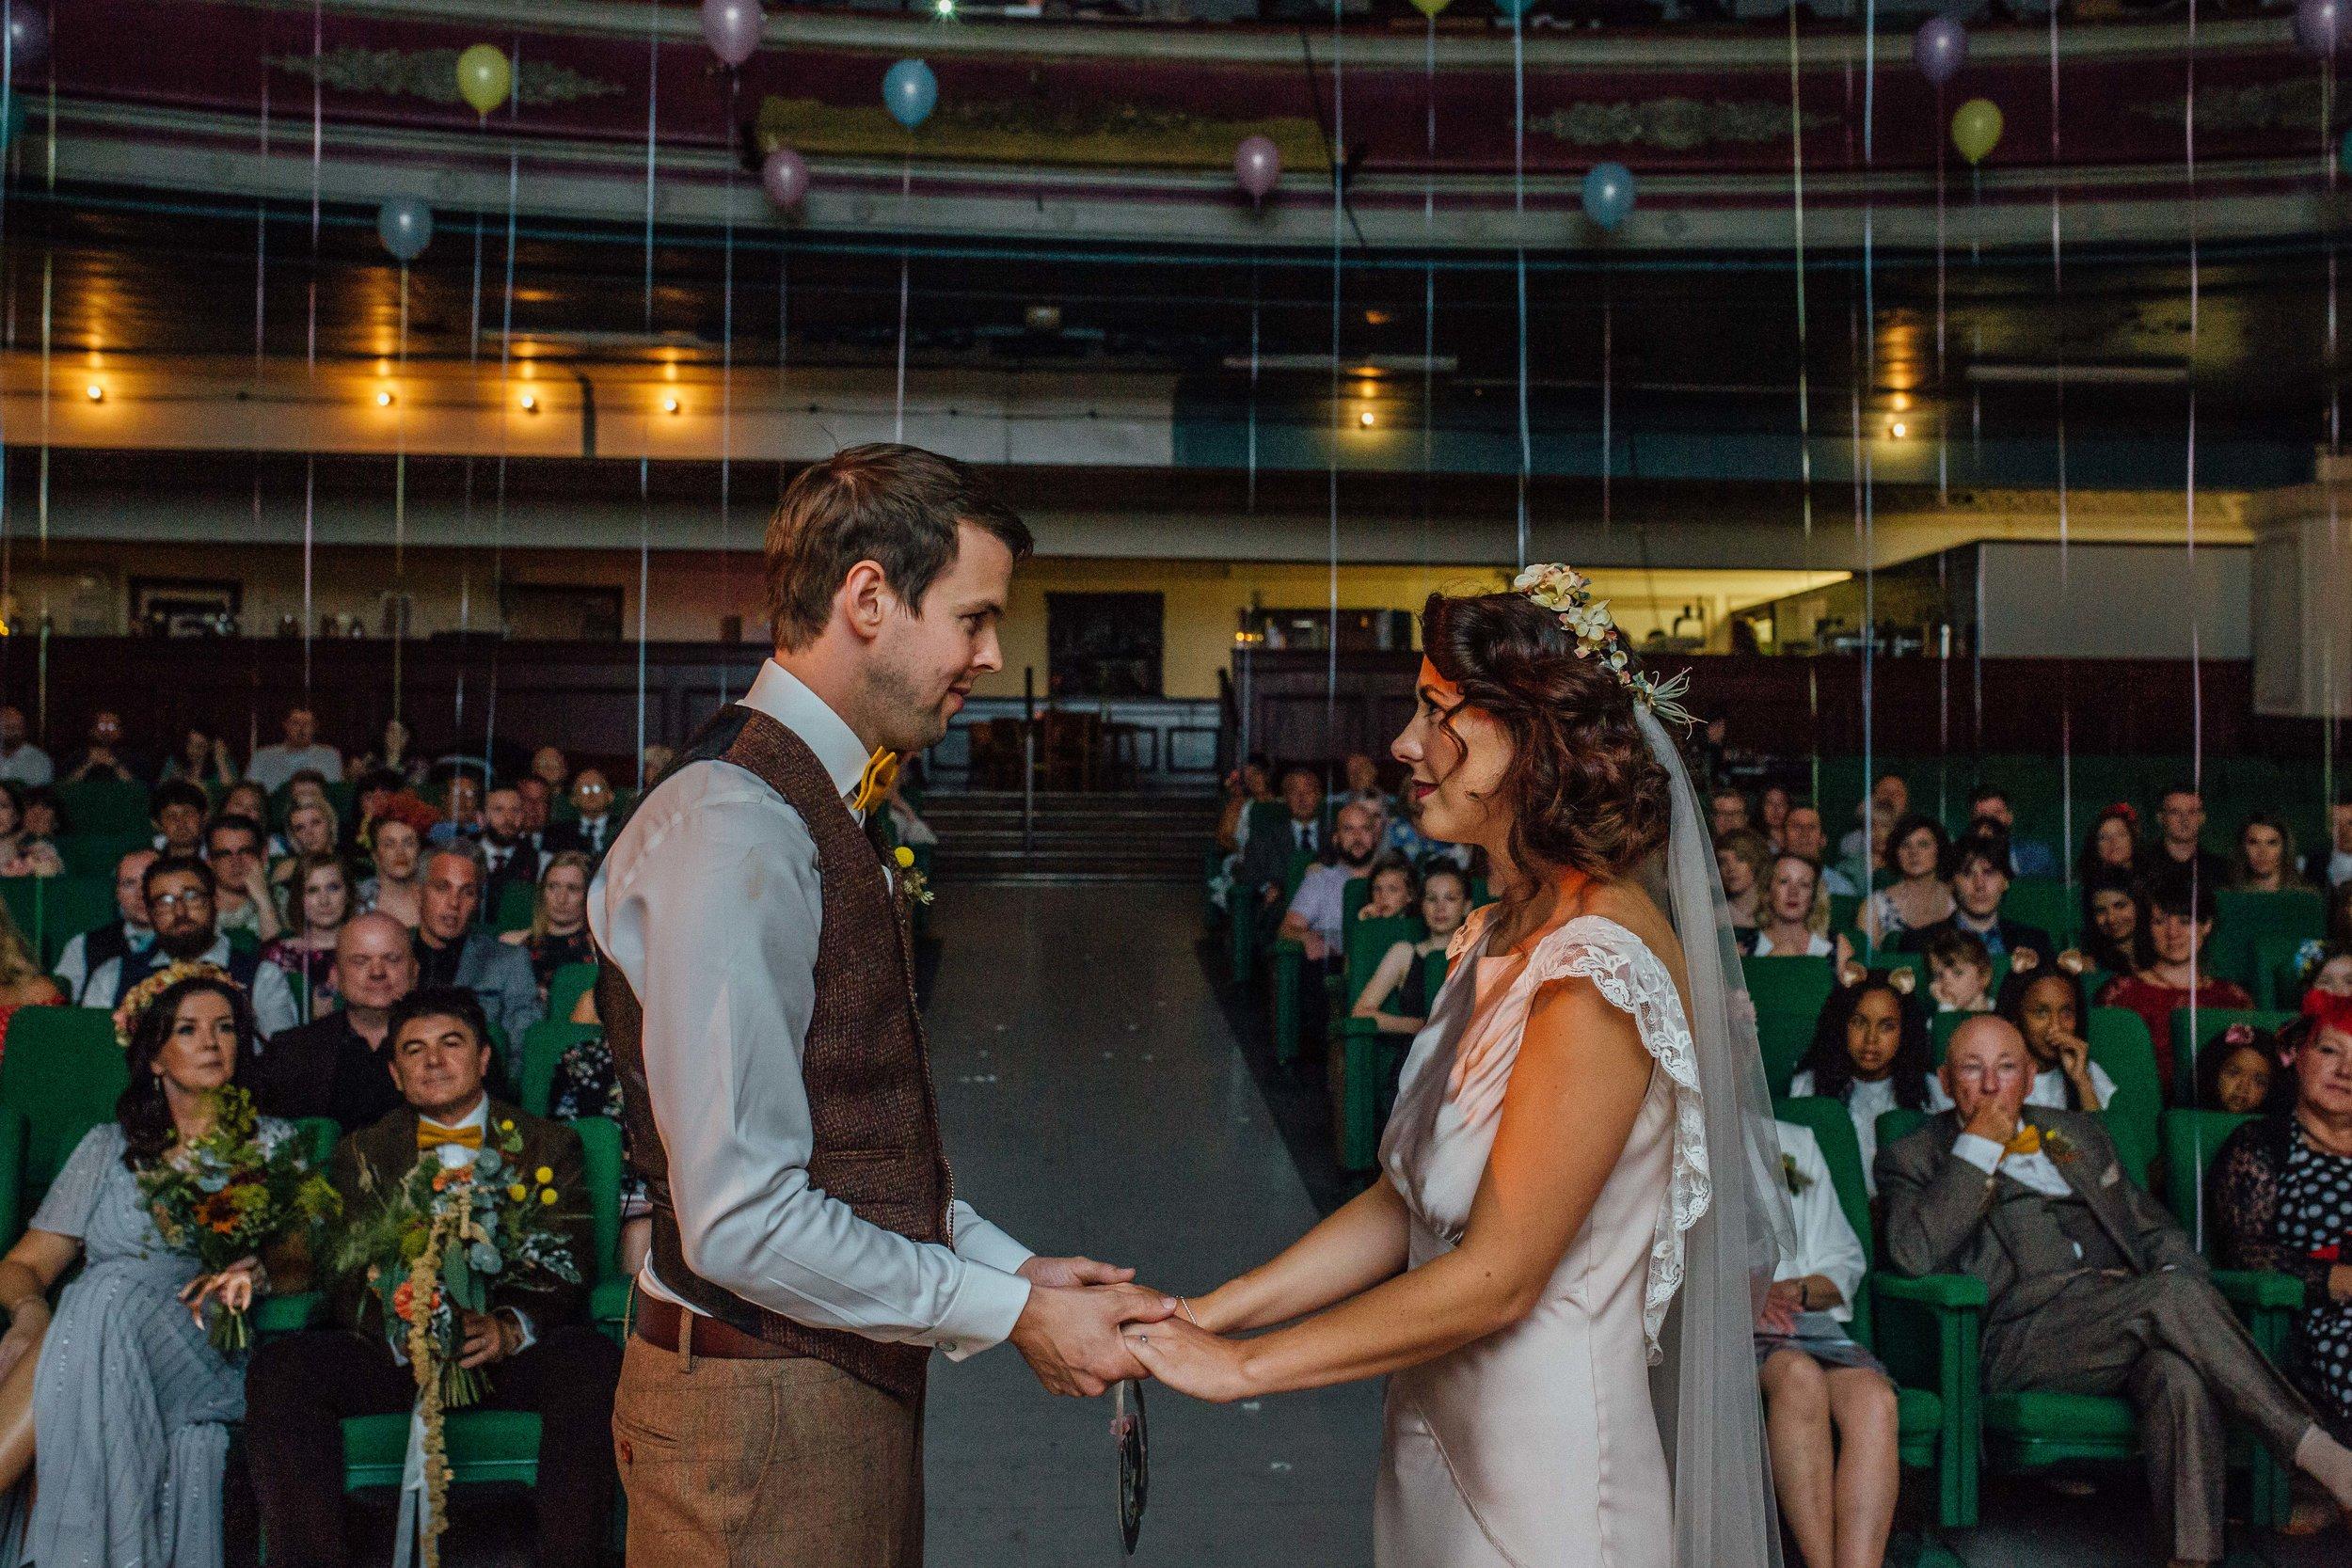 Katy-Bespoke-Veil-Sheffield-Wedding-Wes-Anderson-Susanna-Greening-Derbyshire-13